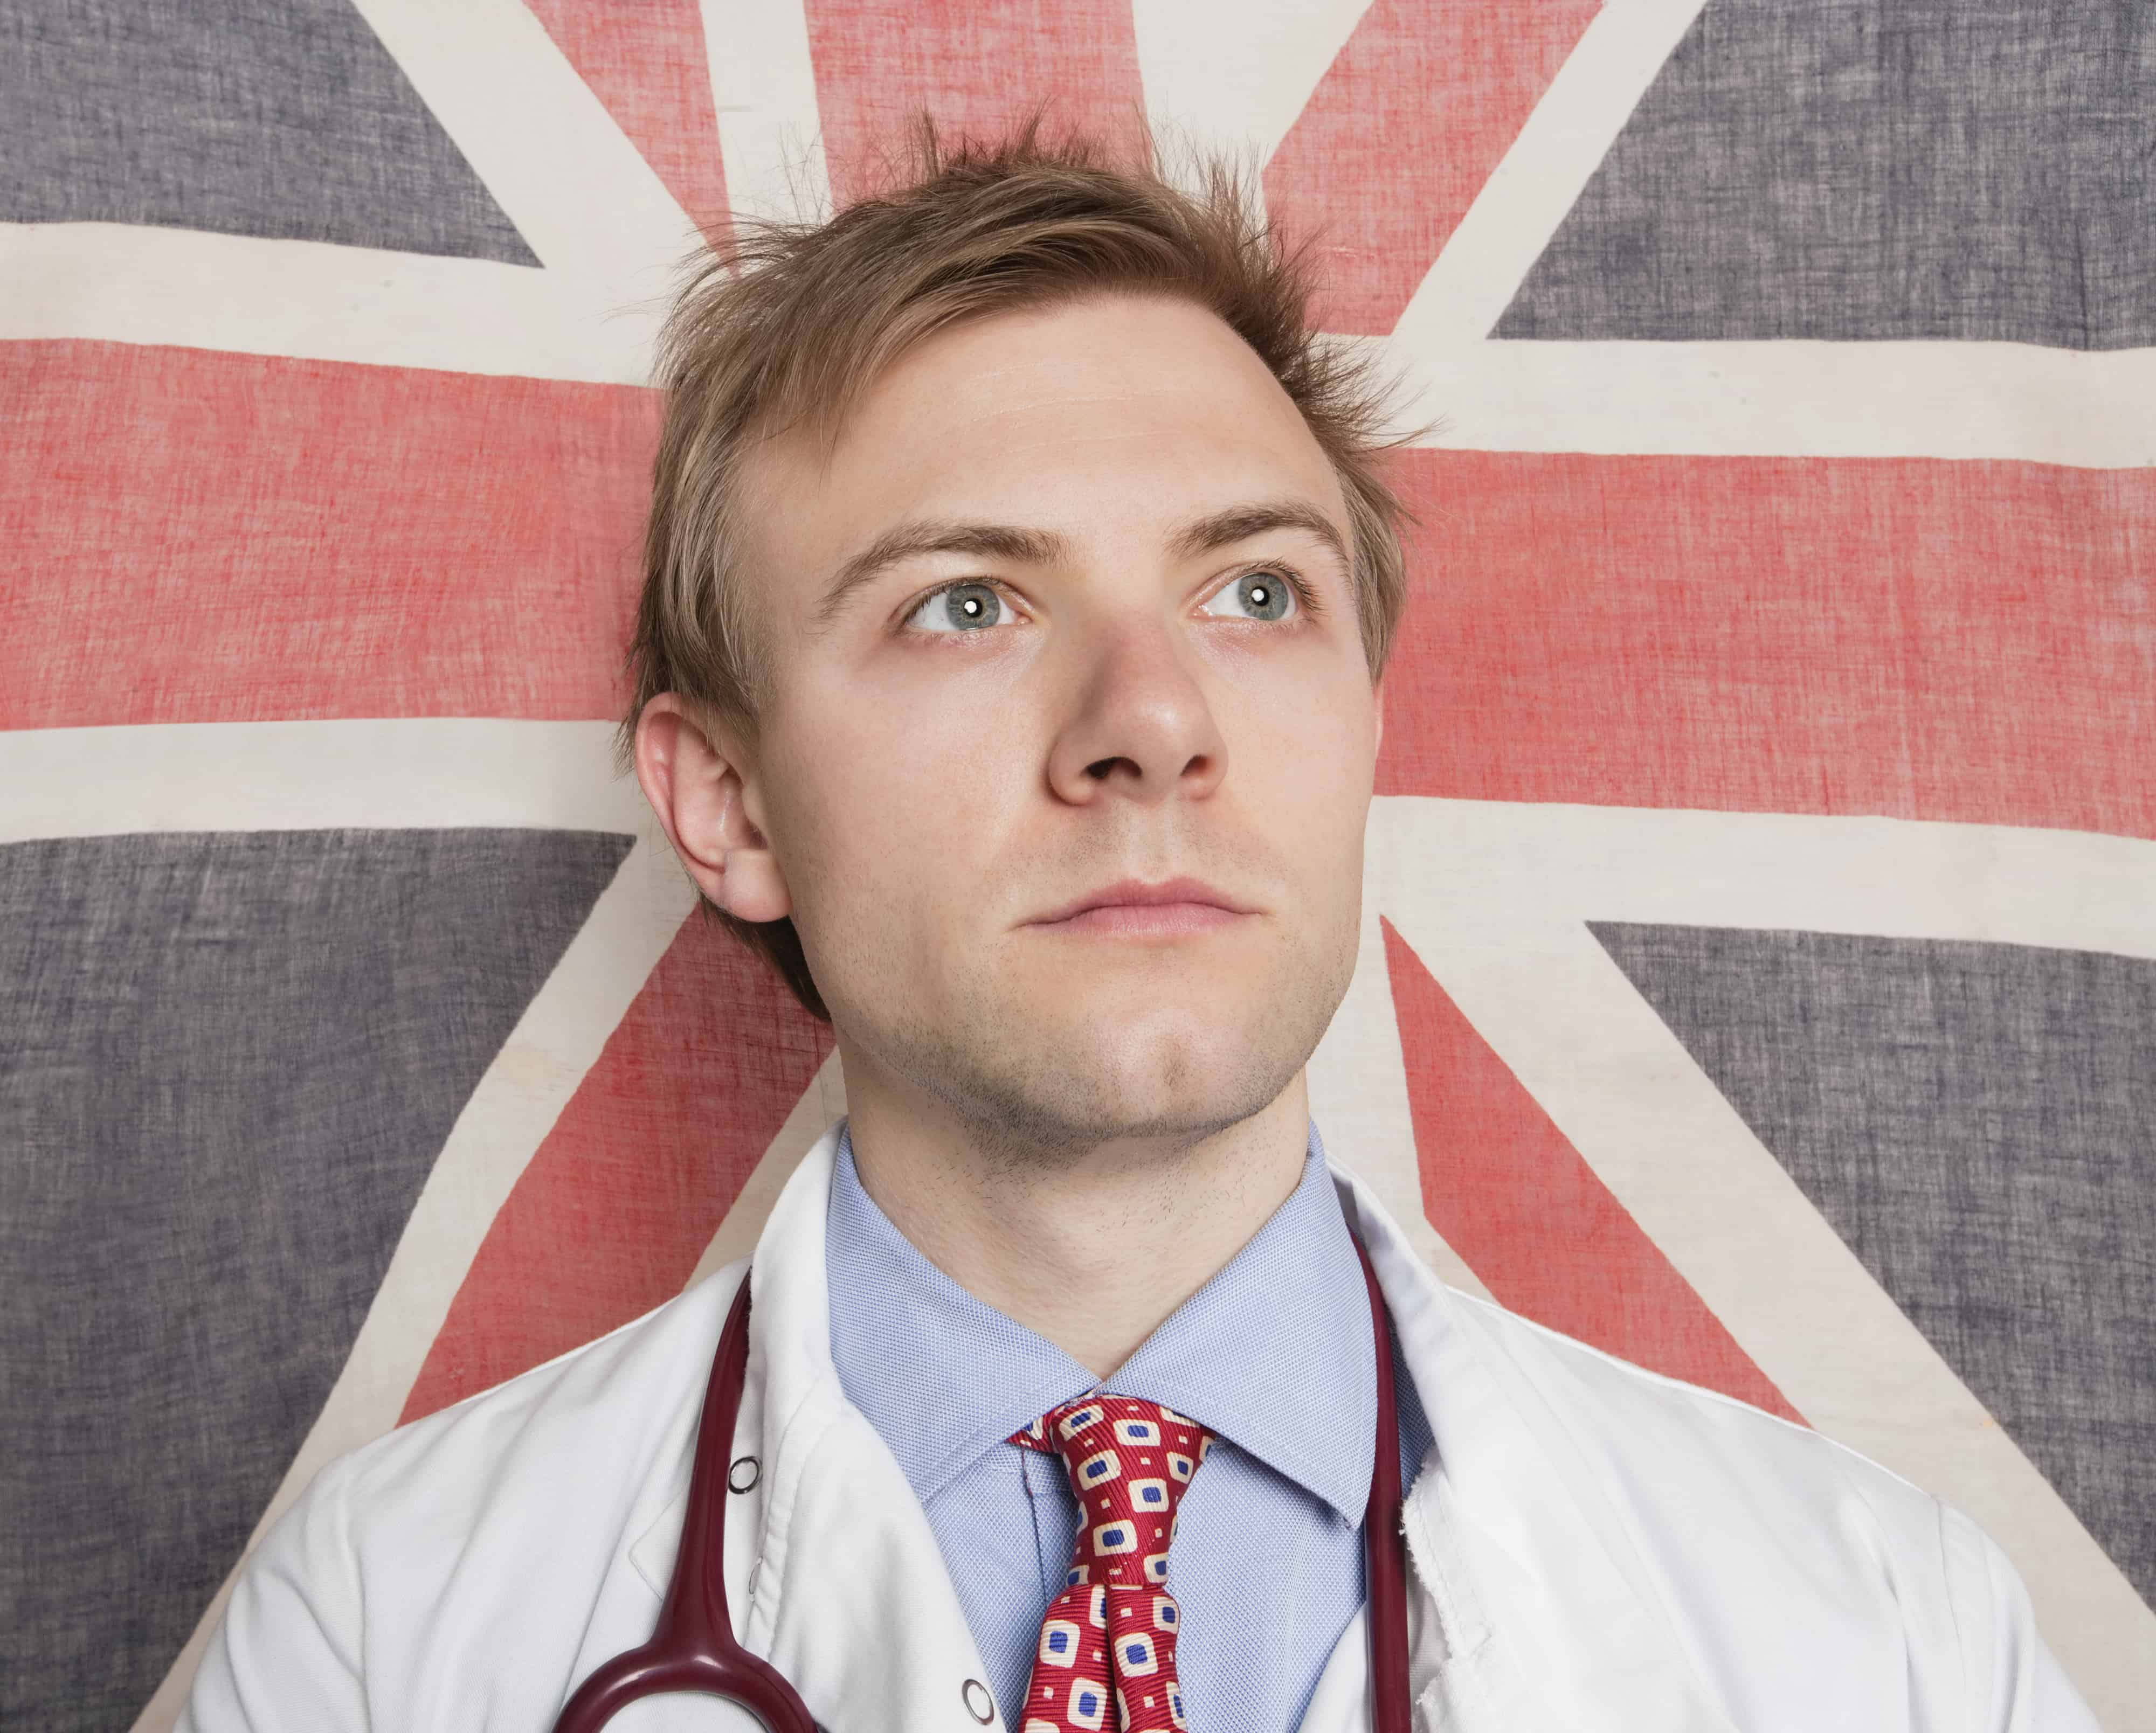 UK Doctors Working In Australia: Prospects, Registration & Costs